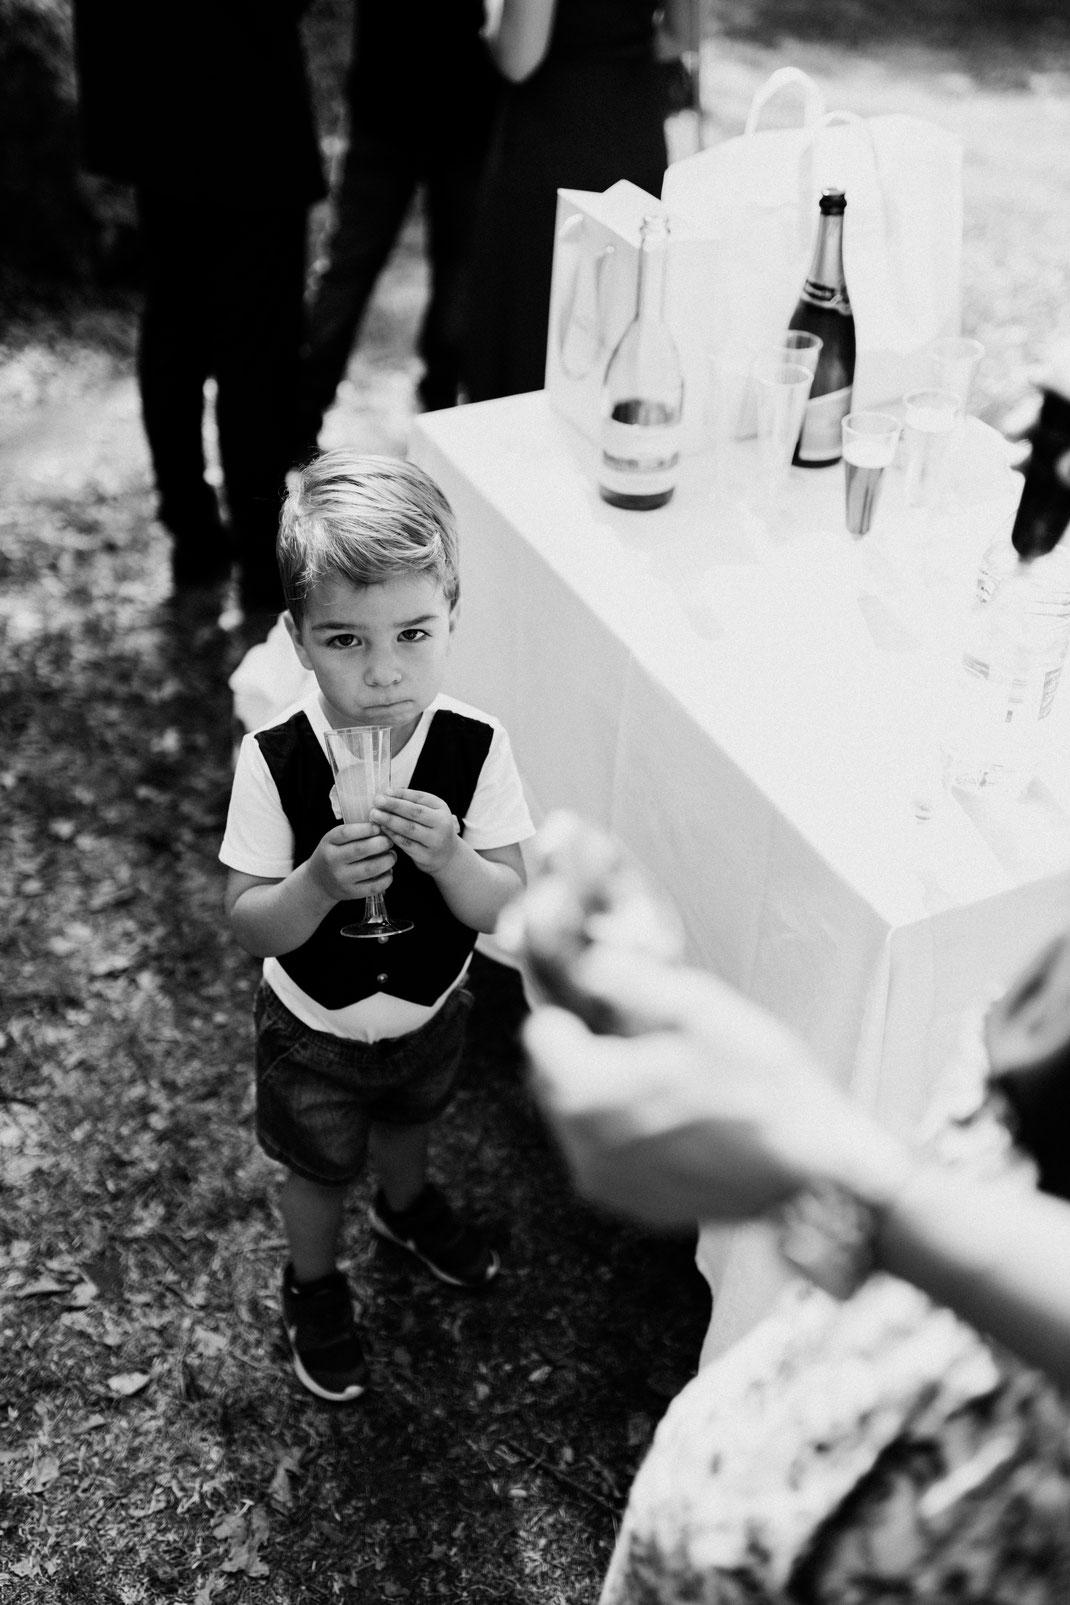 Hochzeitsfotograf Saarland - Fotograf Kai Kreutzer 615